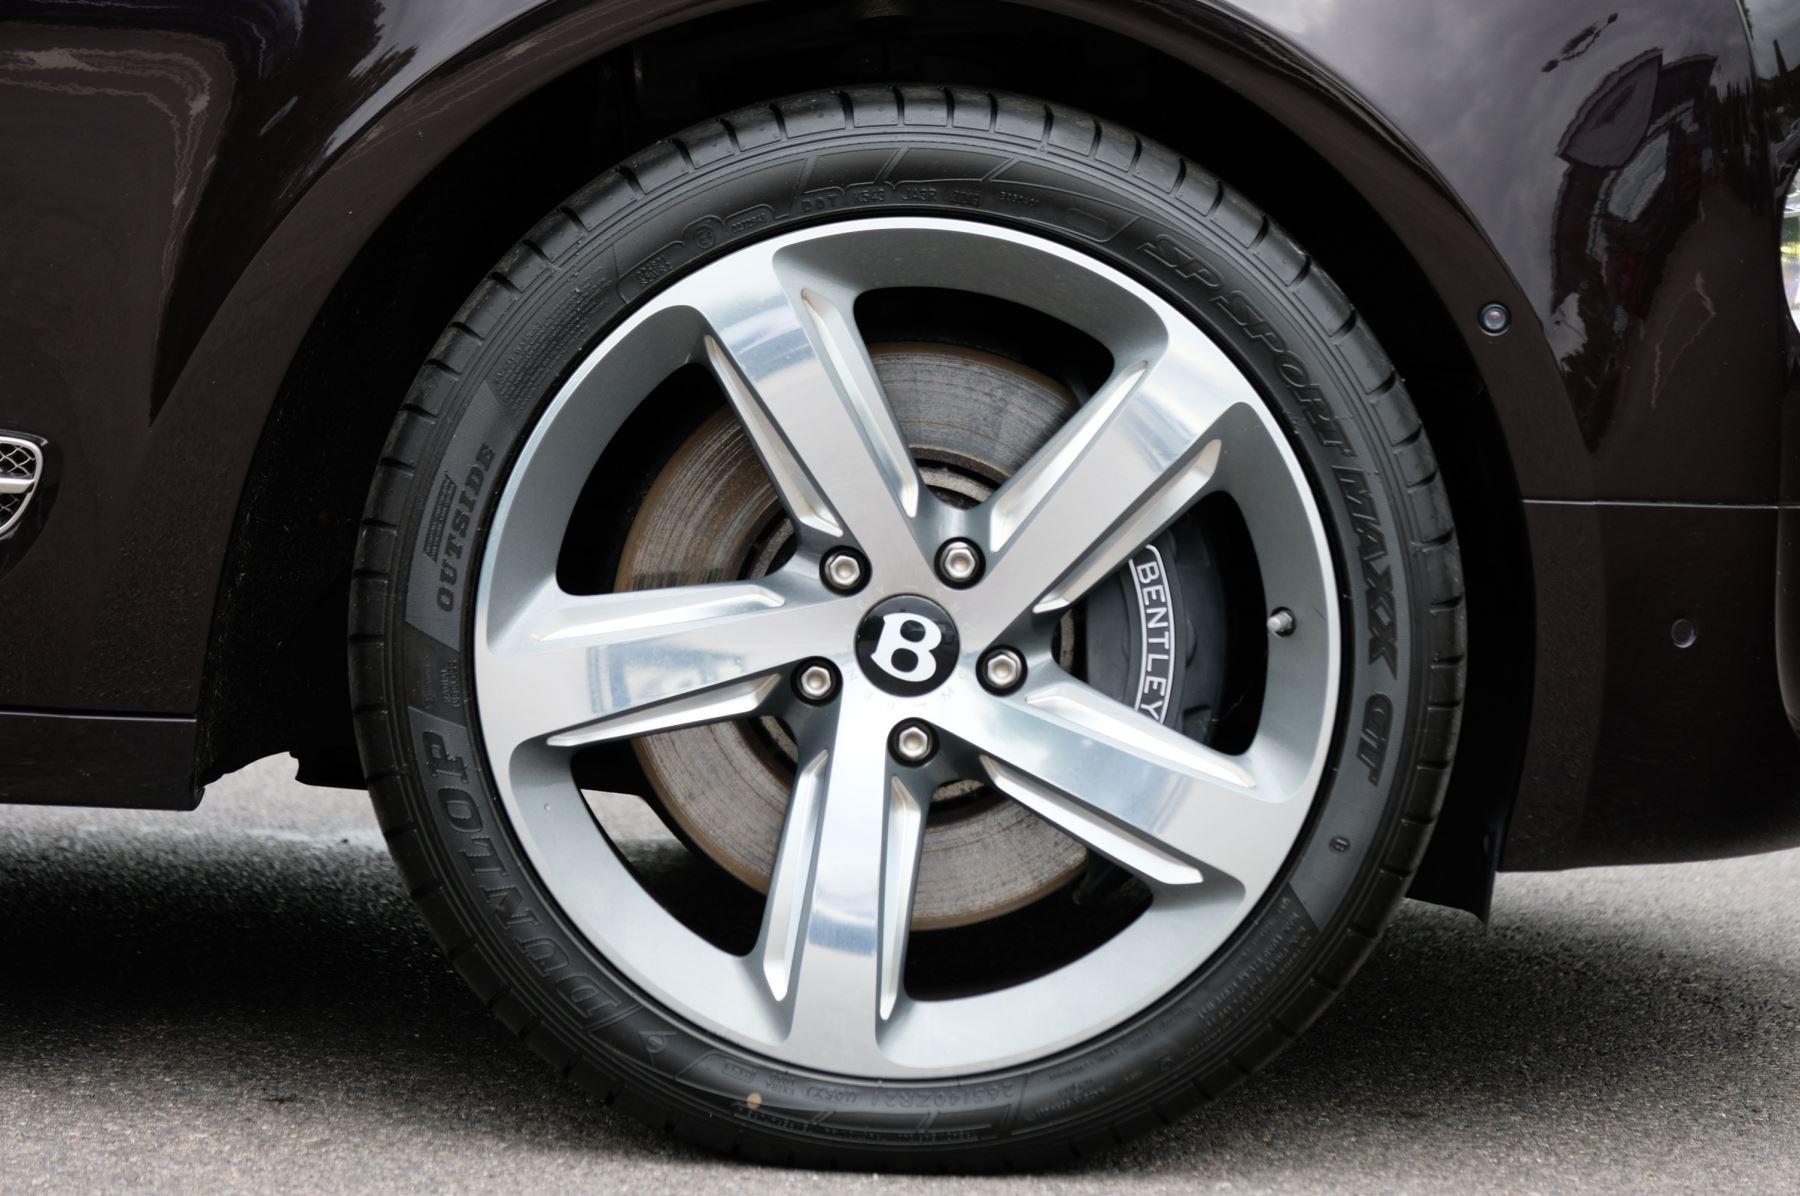 Bentley Mulsanne 6.8 V8 Speed - Speed Premier Specification image 10